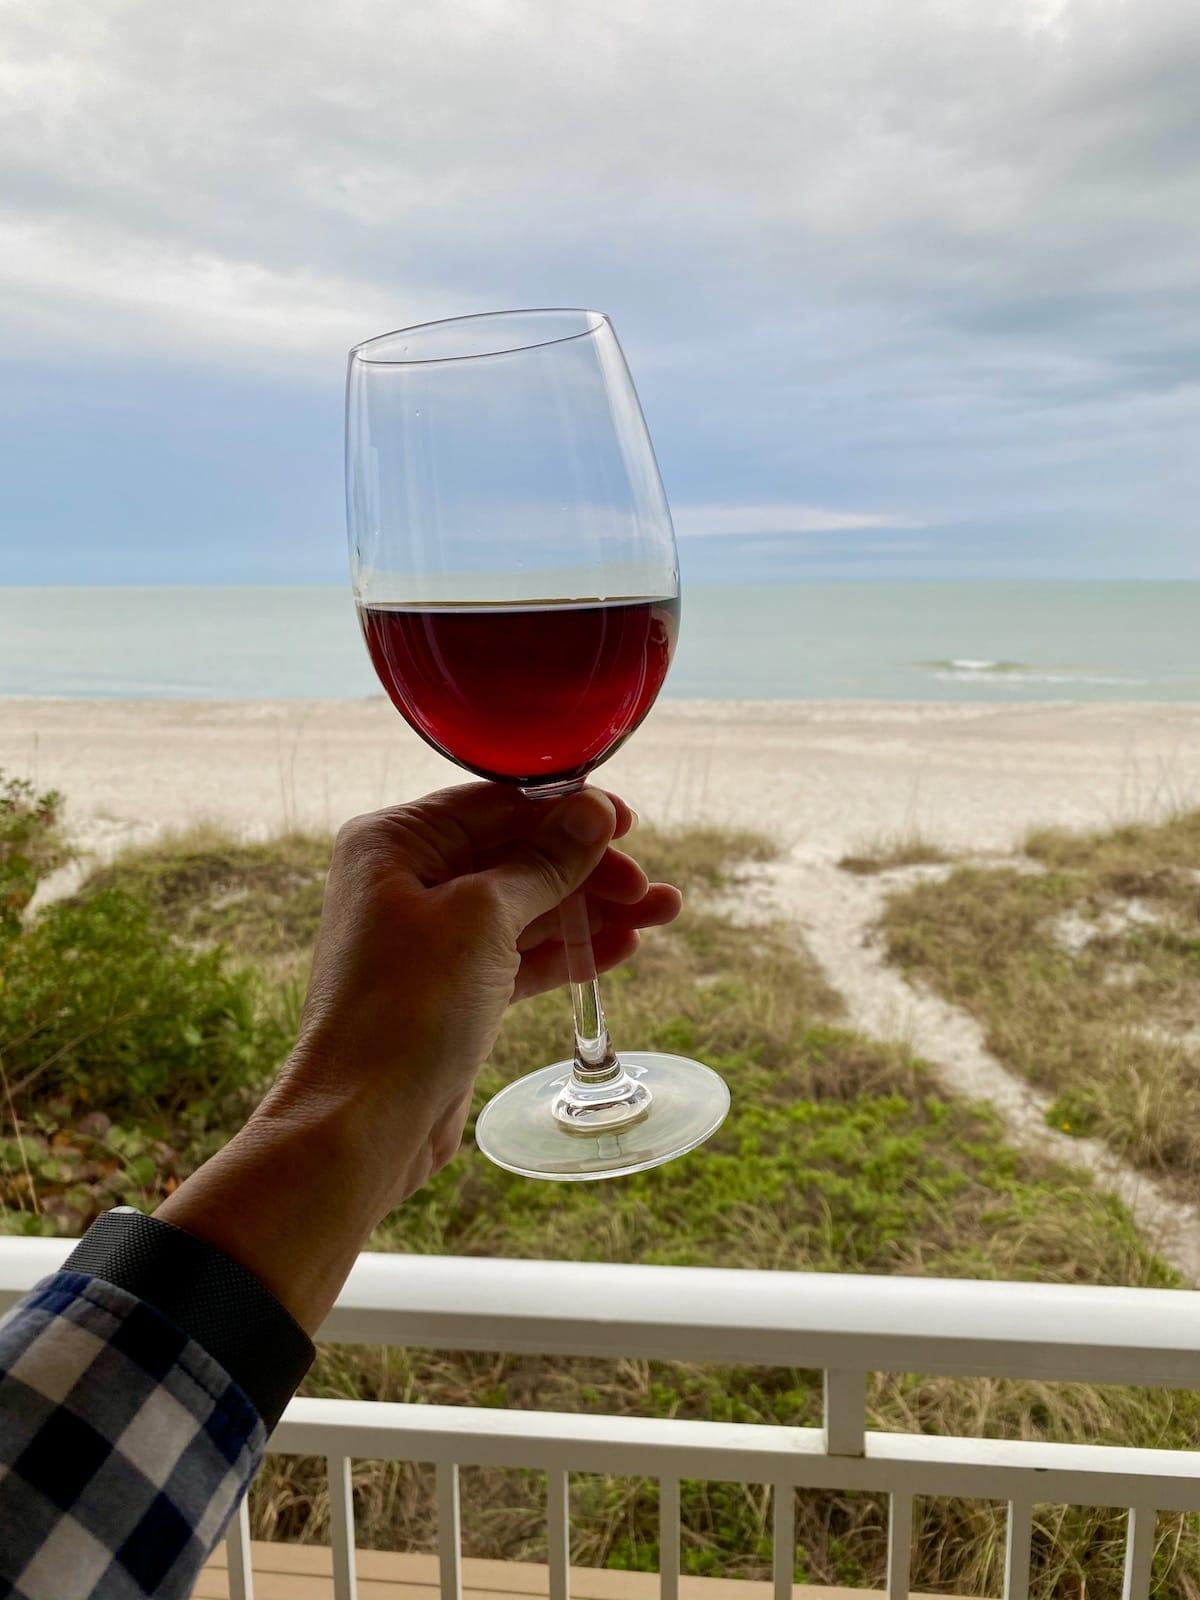 Toasting with wine on the balcony at Mainsail Beach Inn.